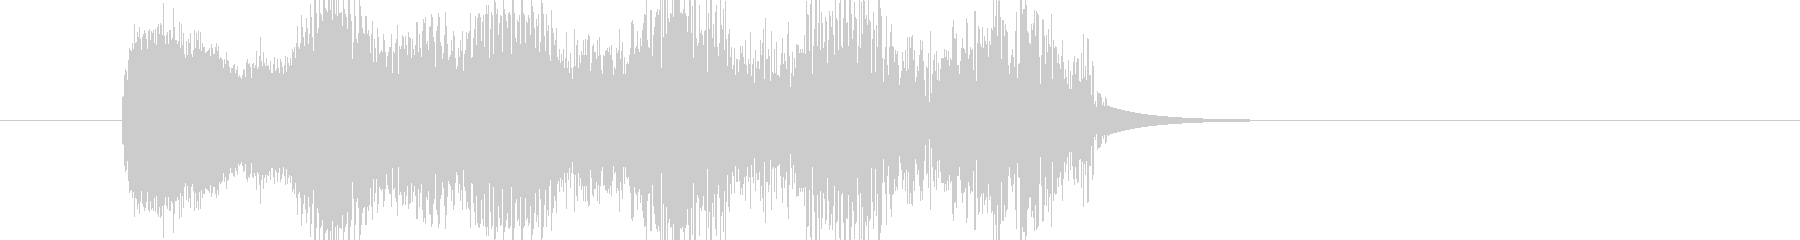 OLDIELASERバージョン6の未再生の波形